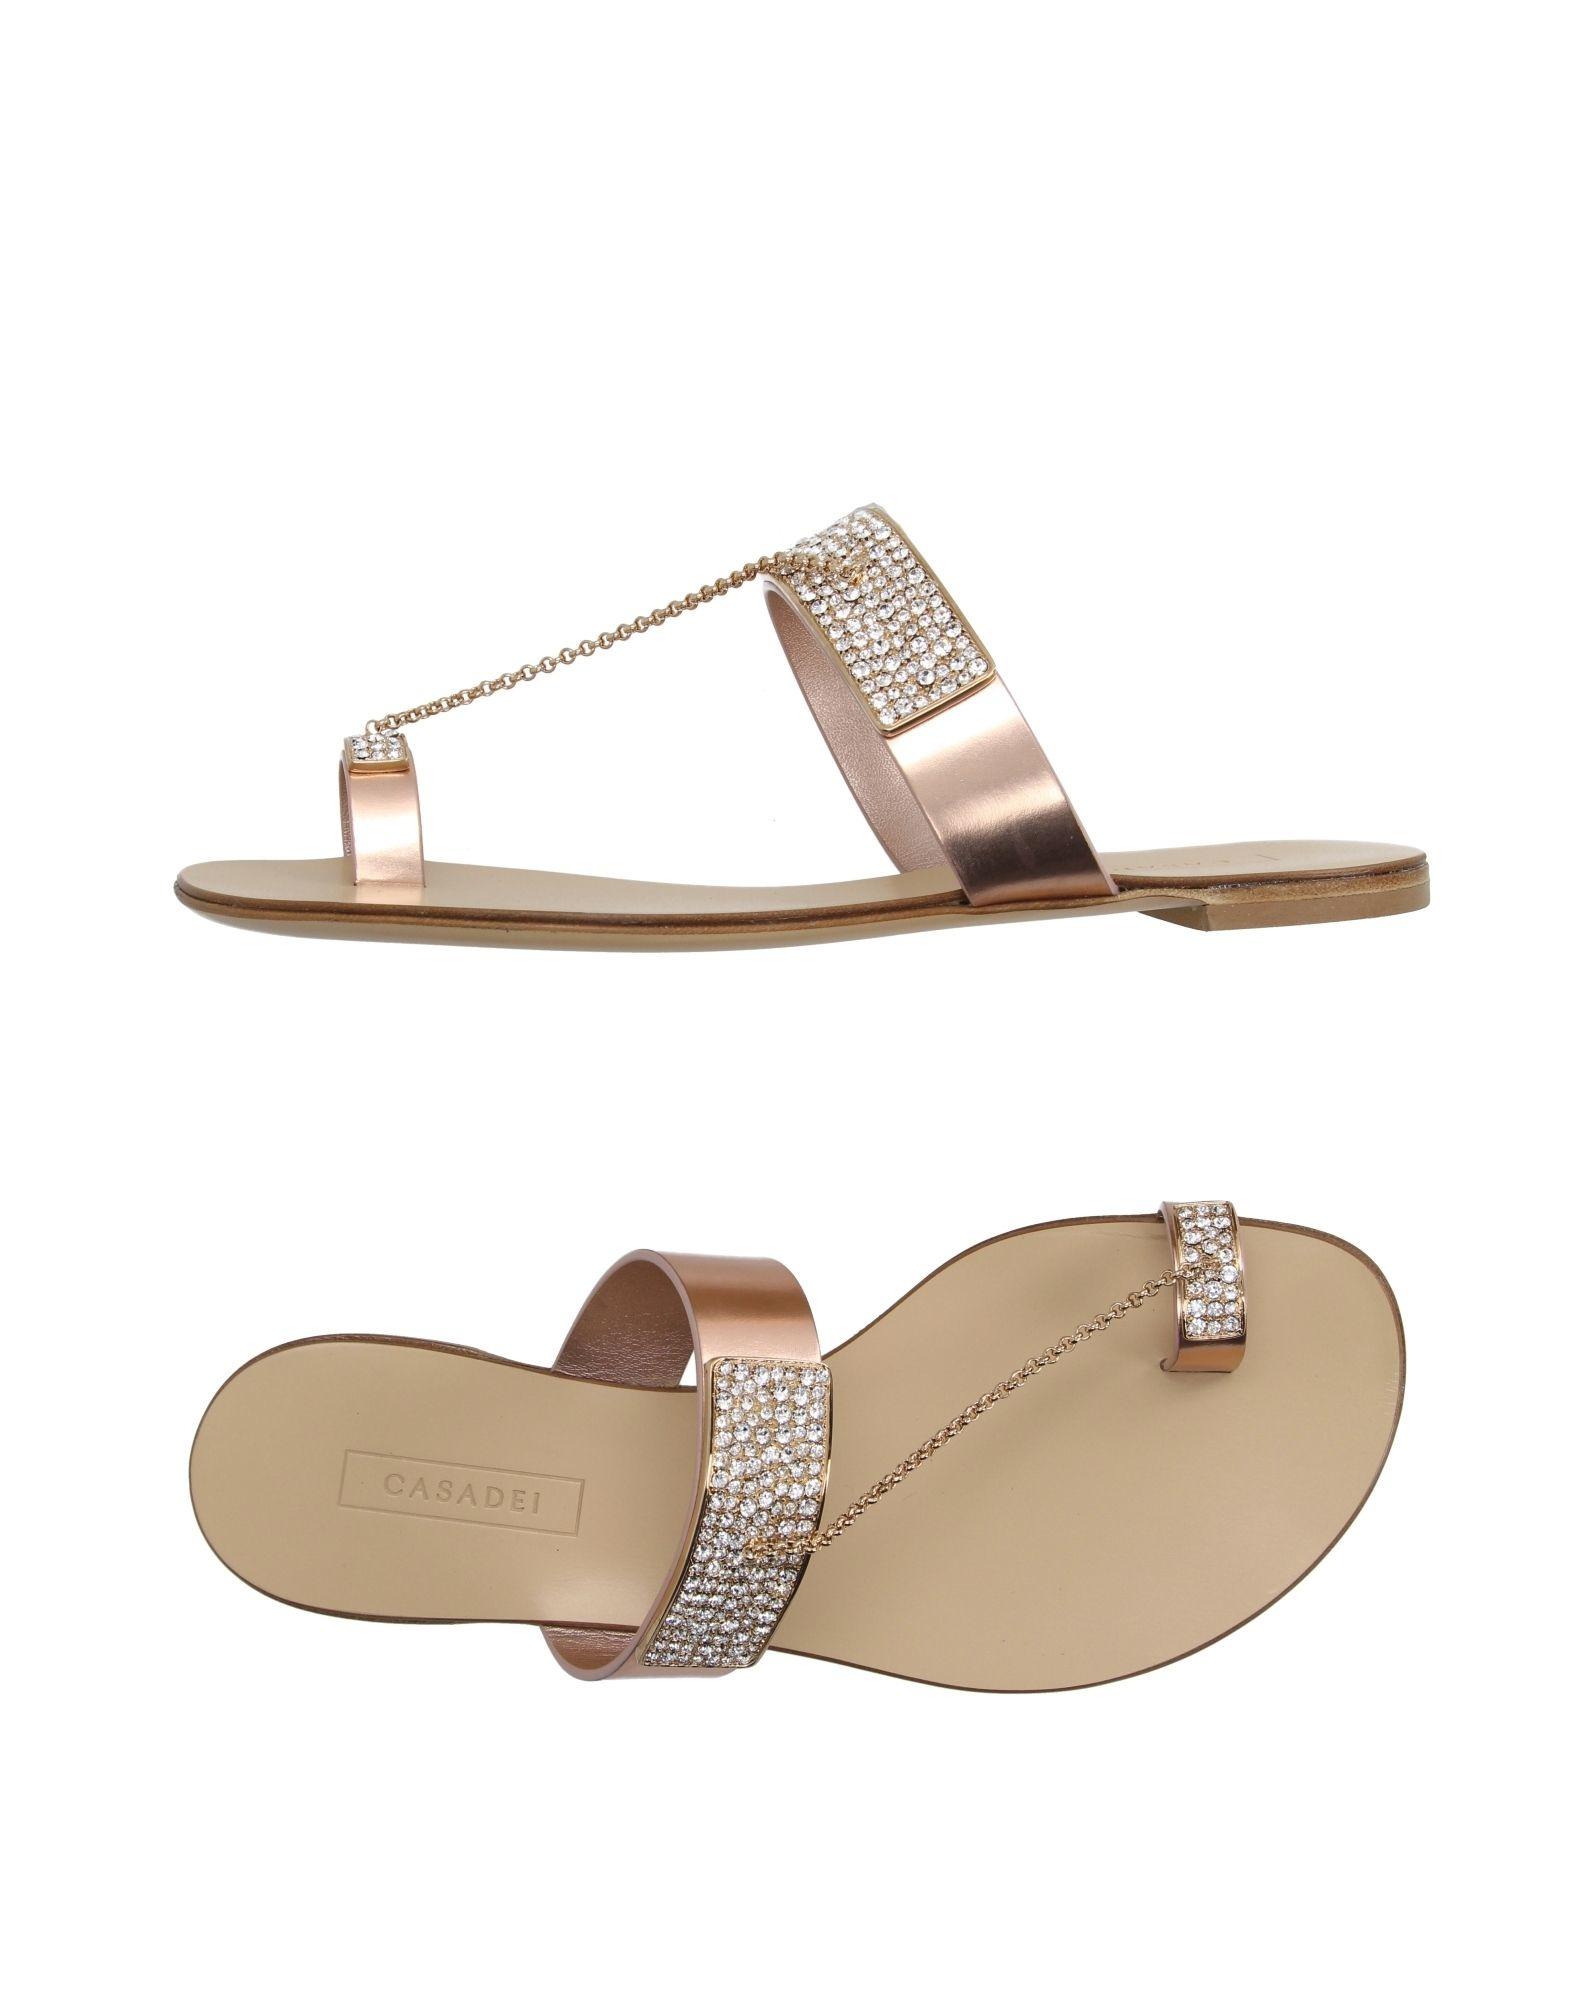 adff8fcfad1 Casadei Thong Sandal in Metallic - Lyst